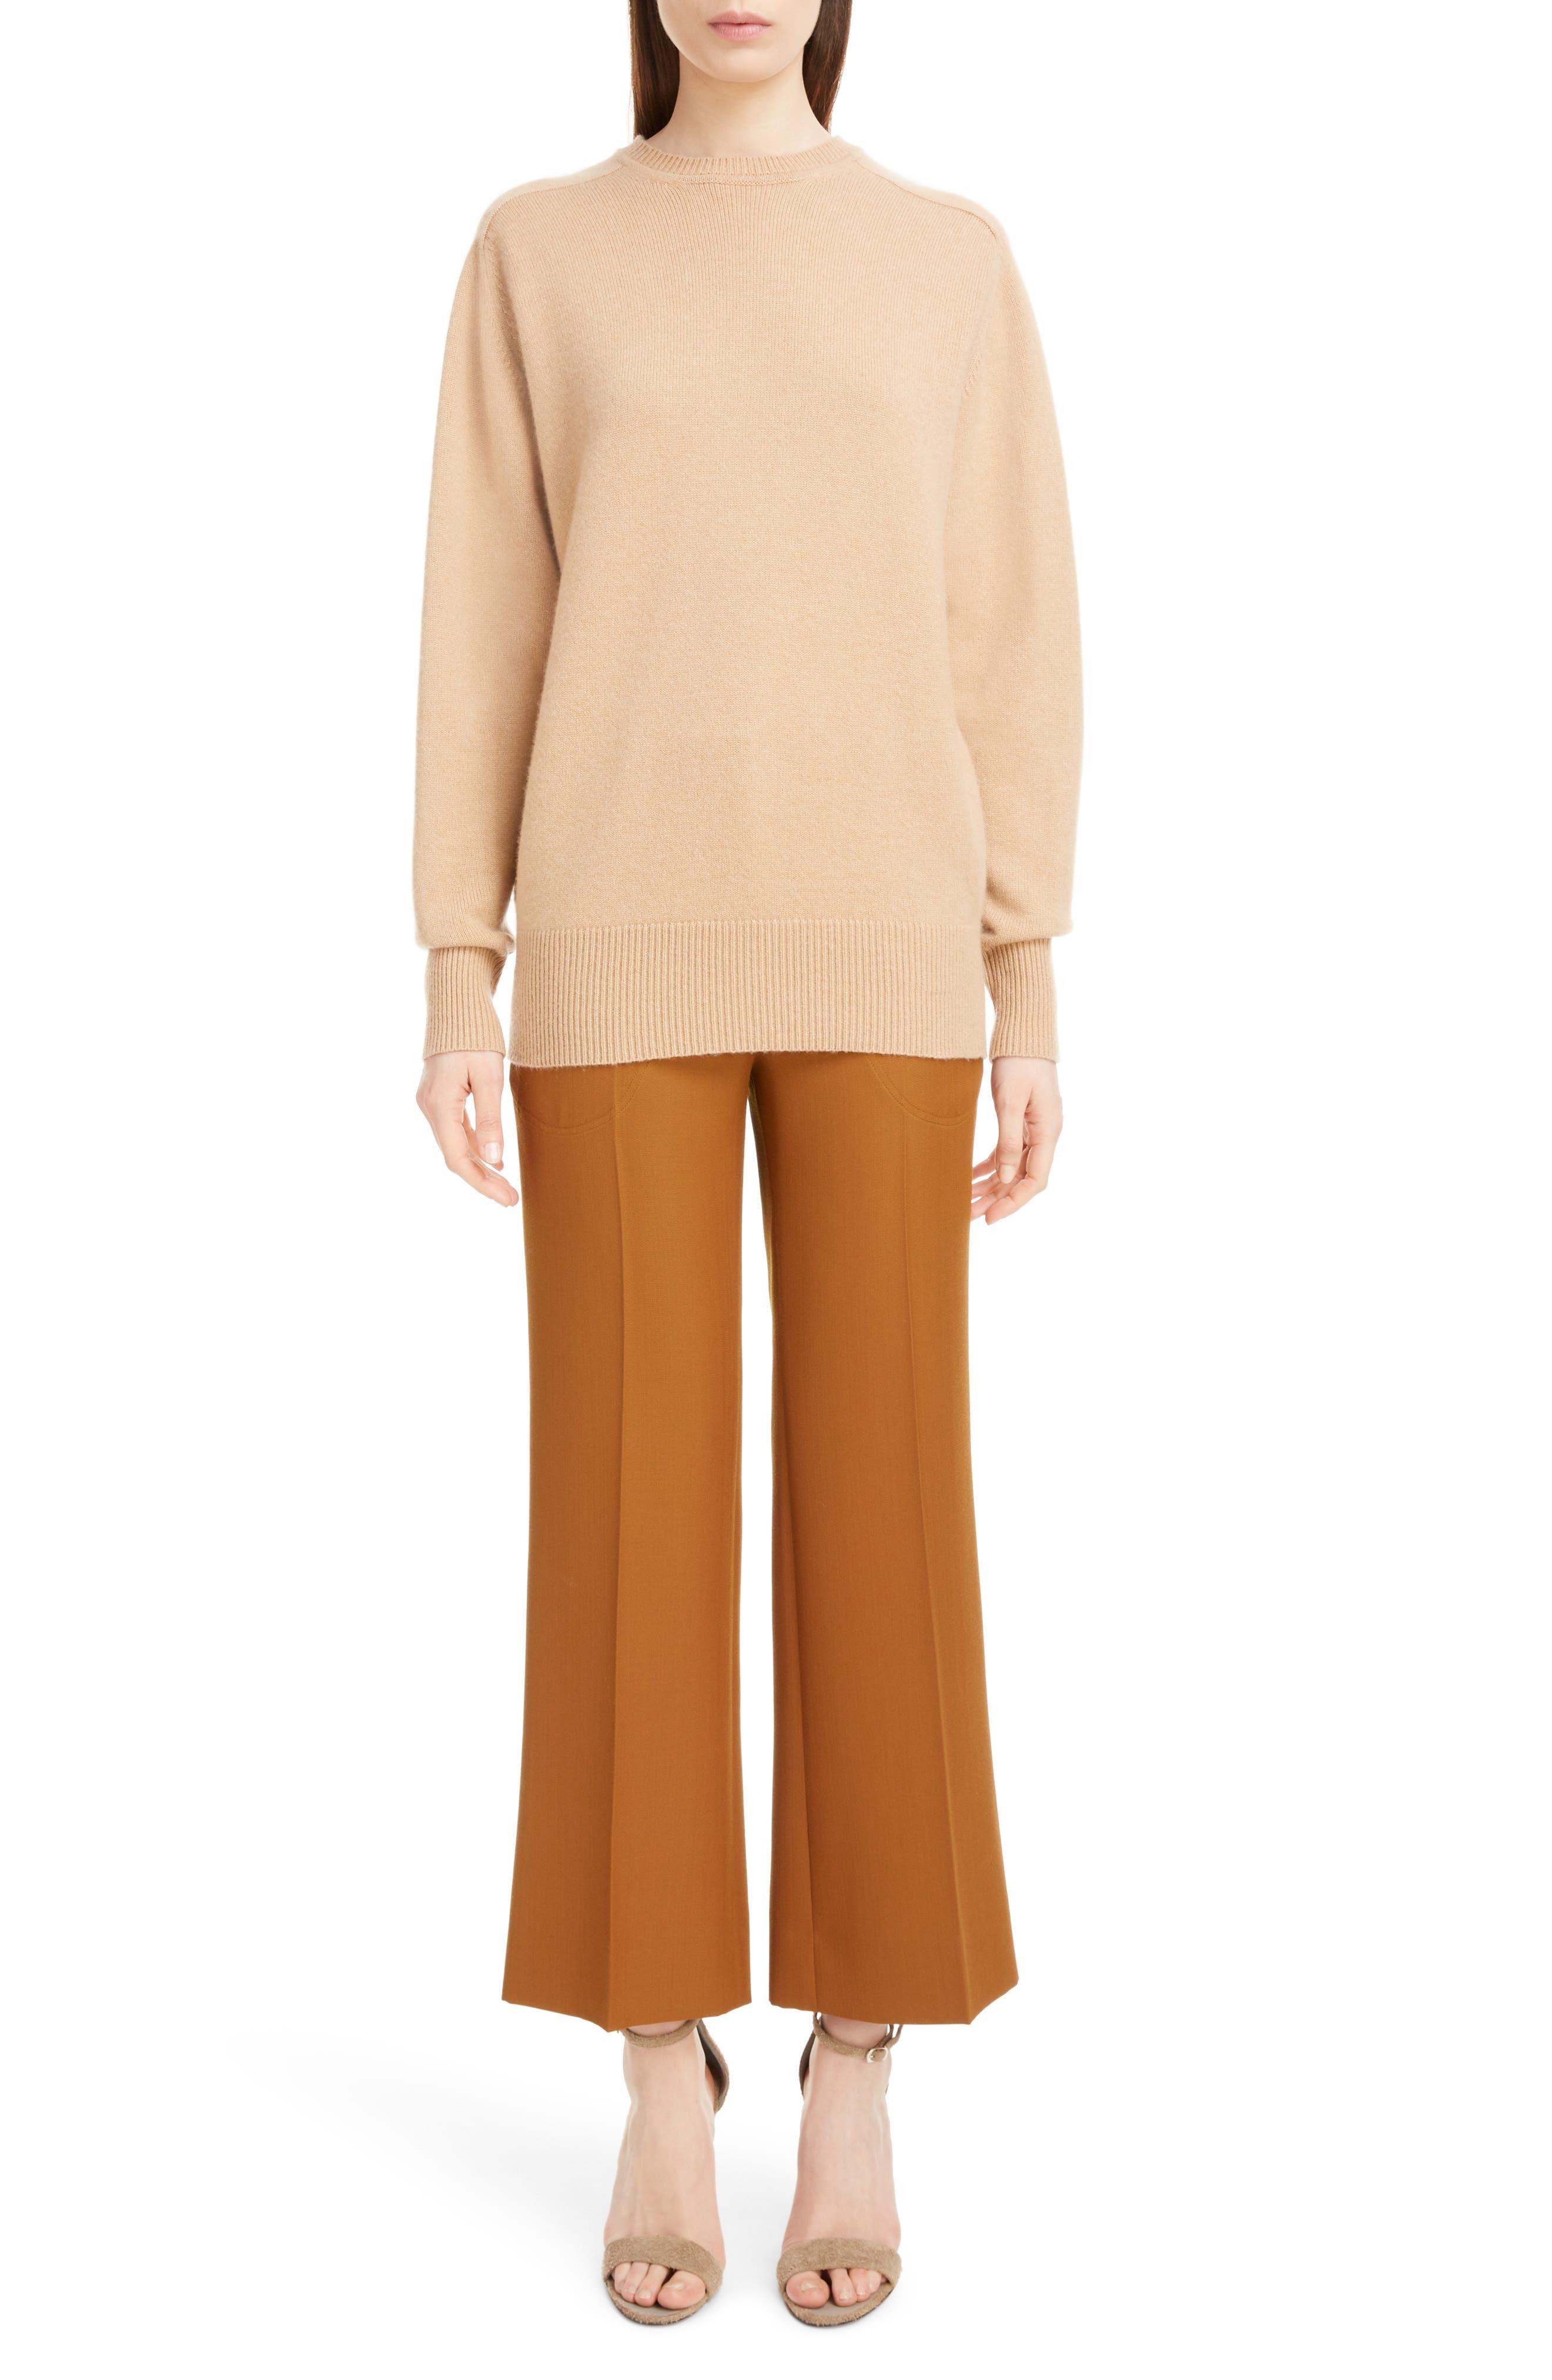 VICTORIA BECKHAM, Cashmere Blend Sweater, Alternate thumbnail 6, color, LIGHT CAMEL